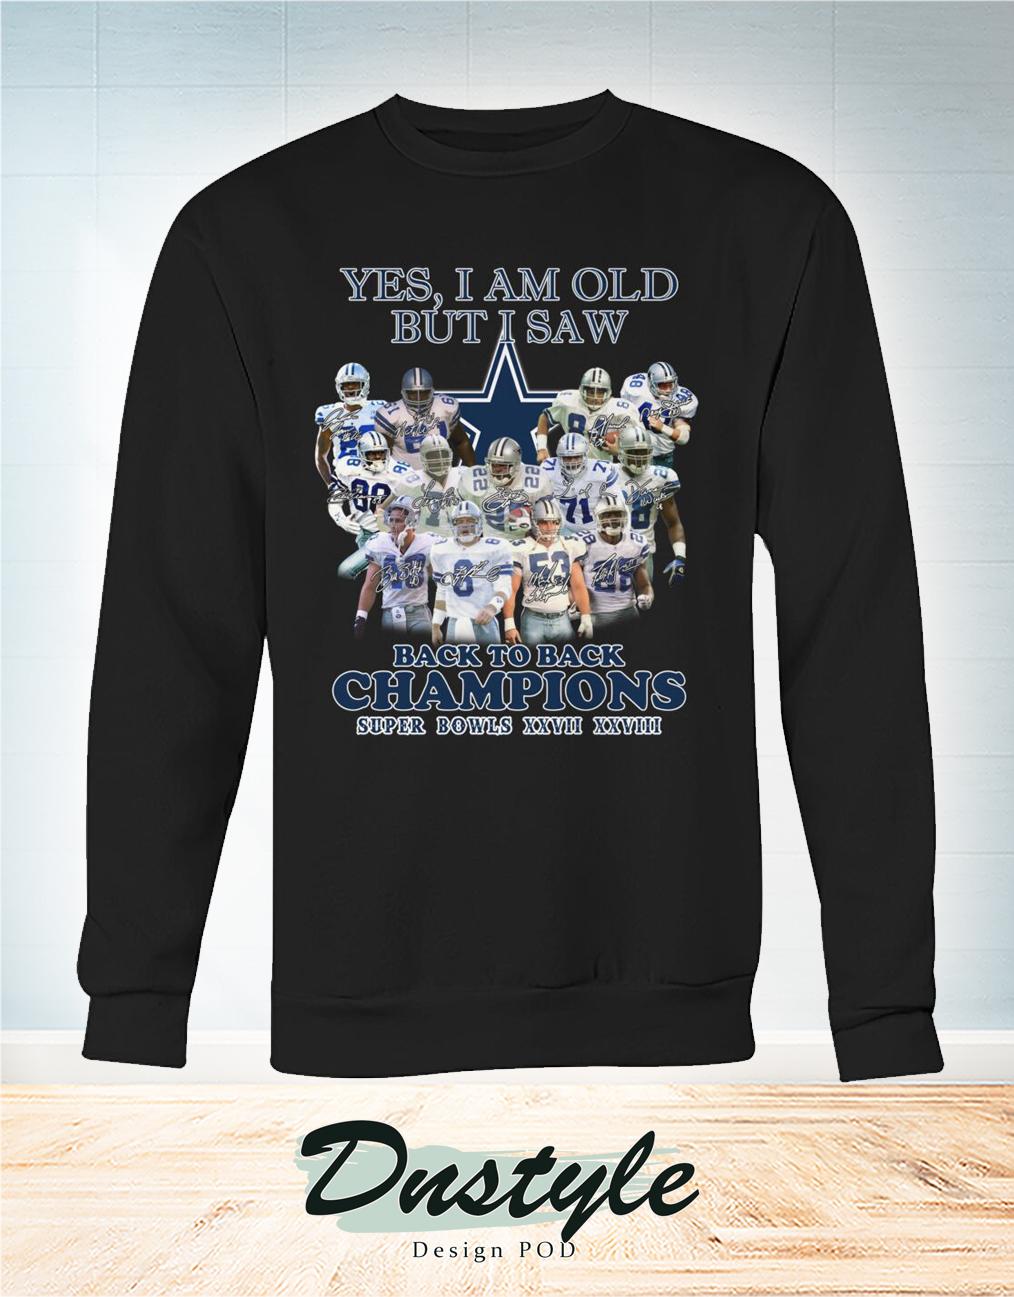 Dallas Cowboys yes I am old but I saw back to back Champions super bowls XXVII XXVIII sweatshirt